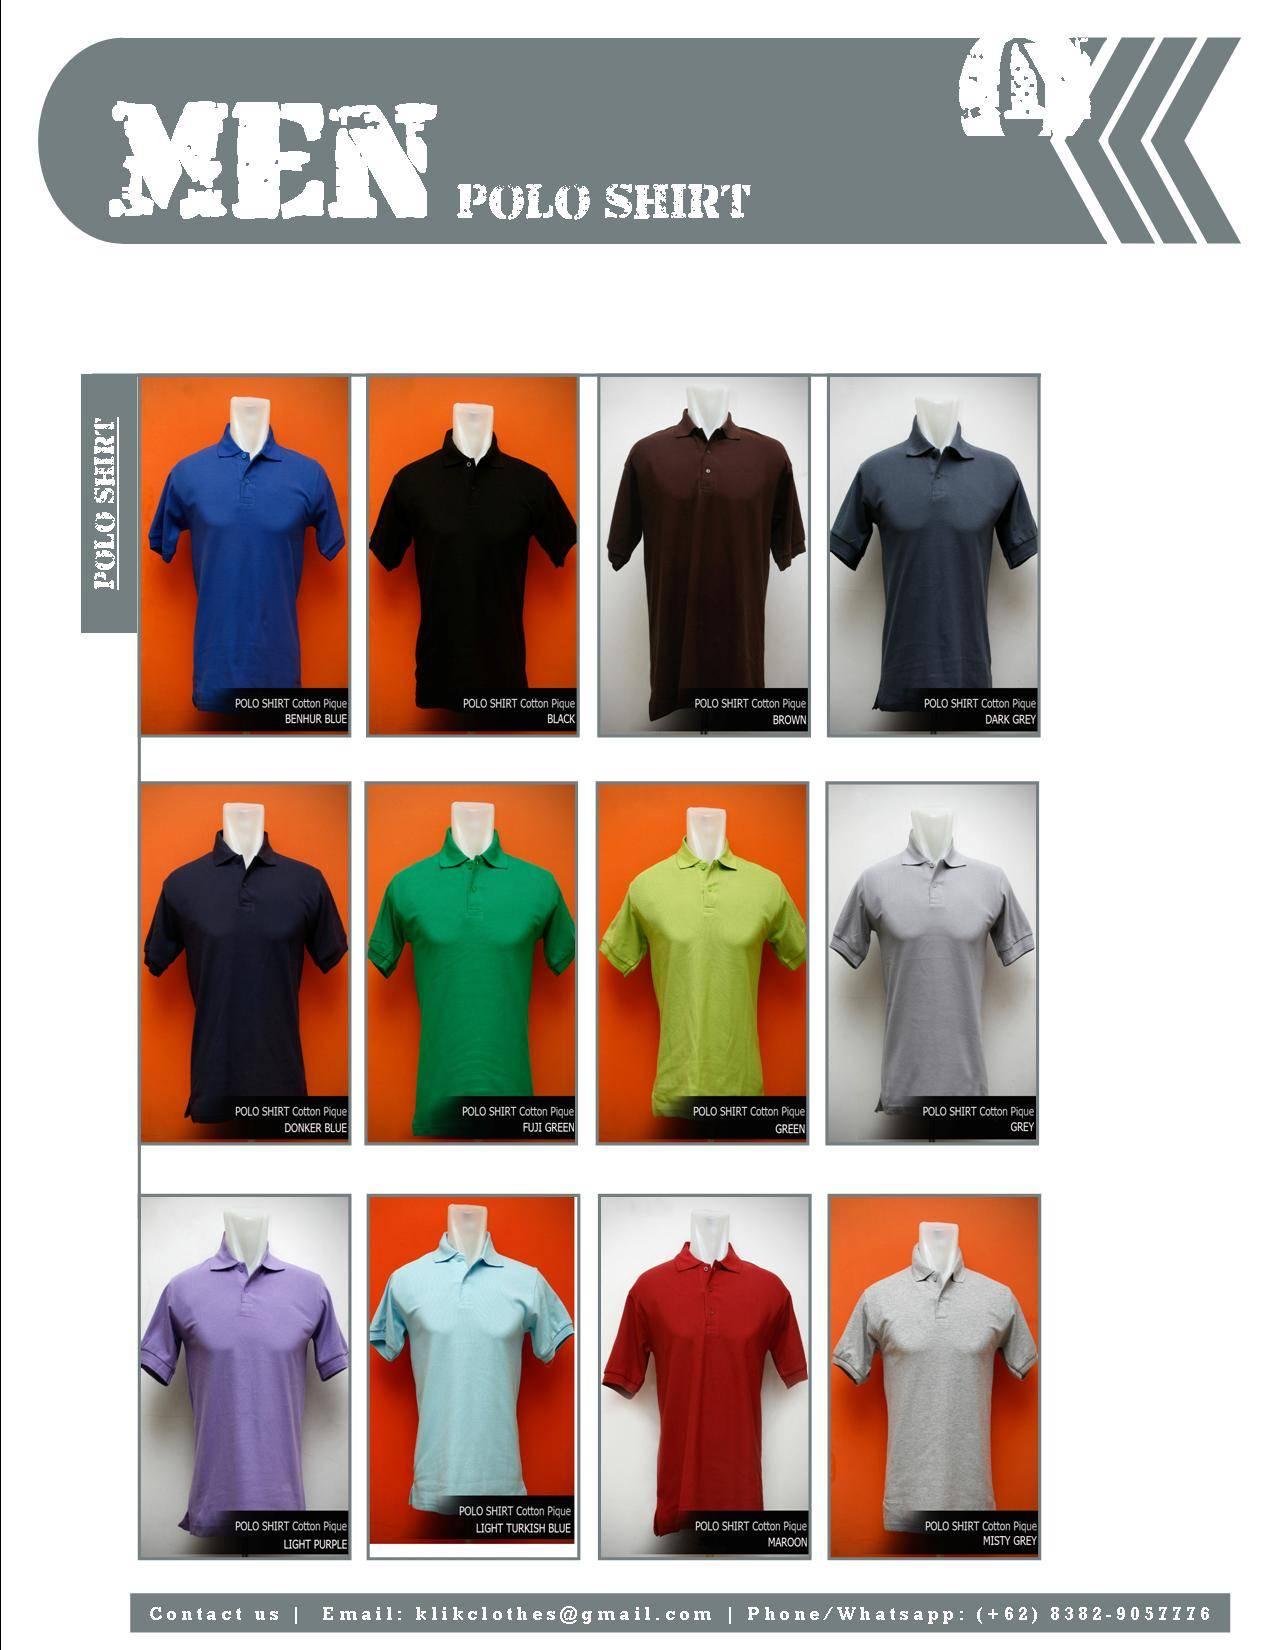 High Quality Plain Polo Shirt